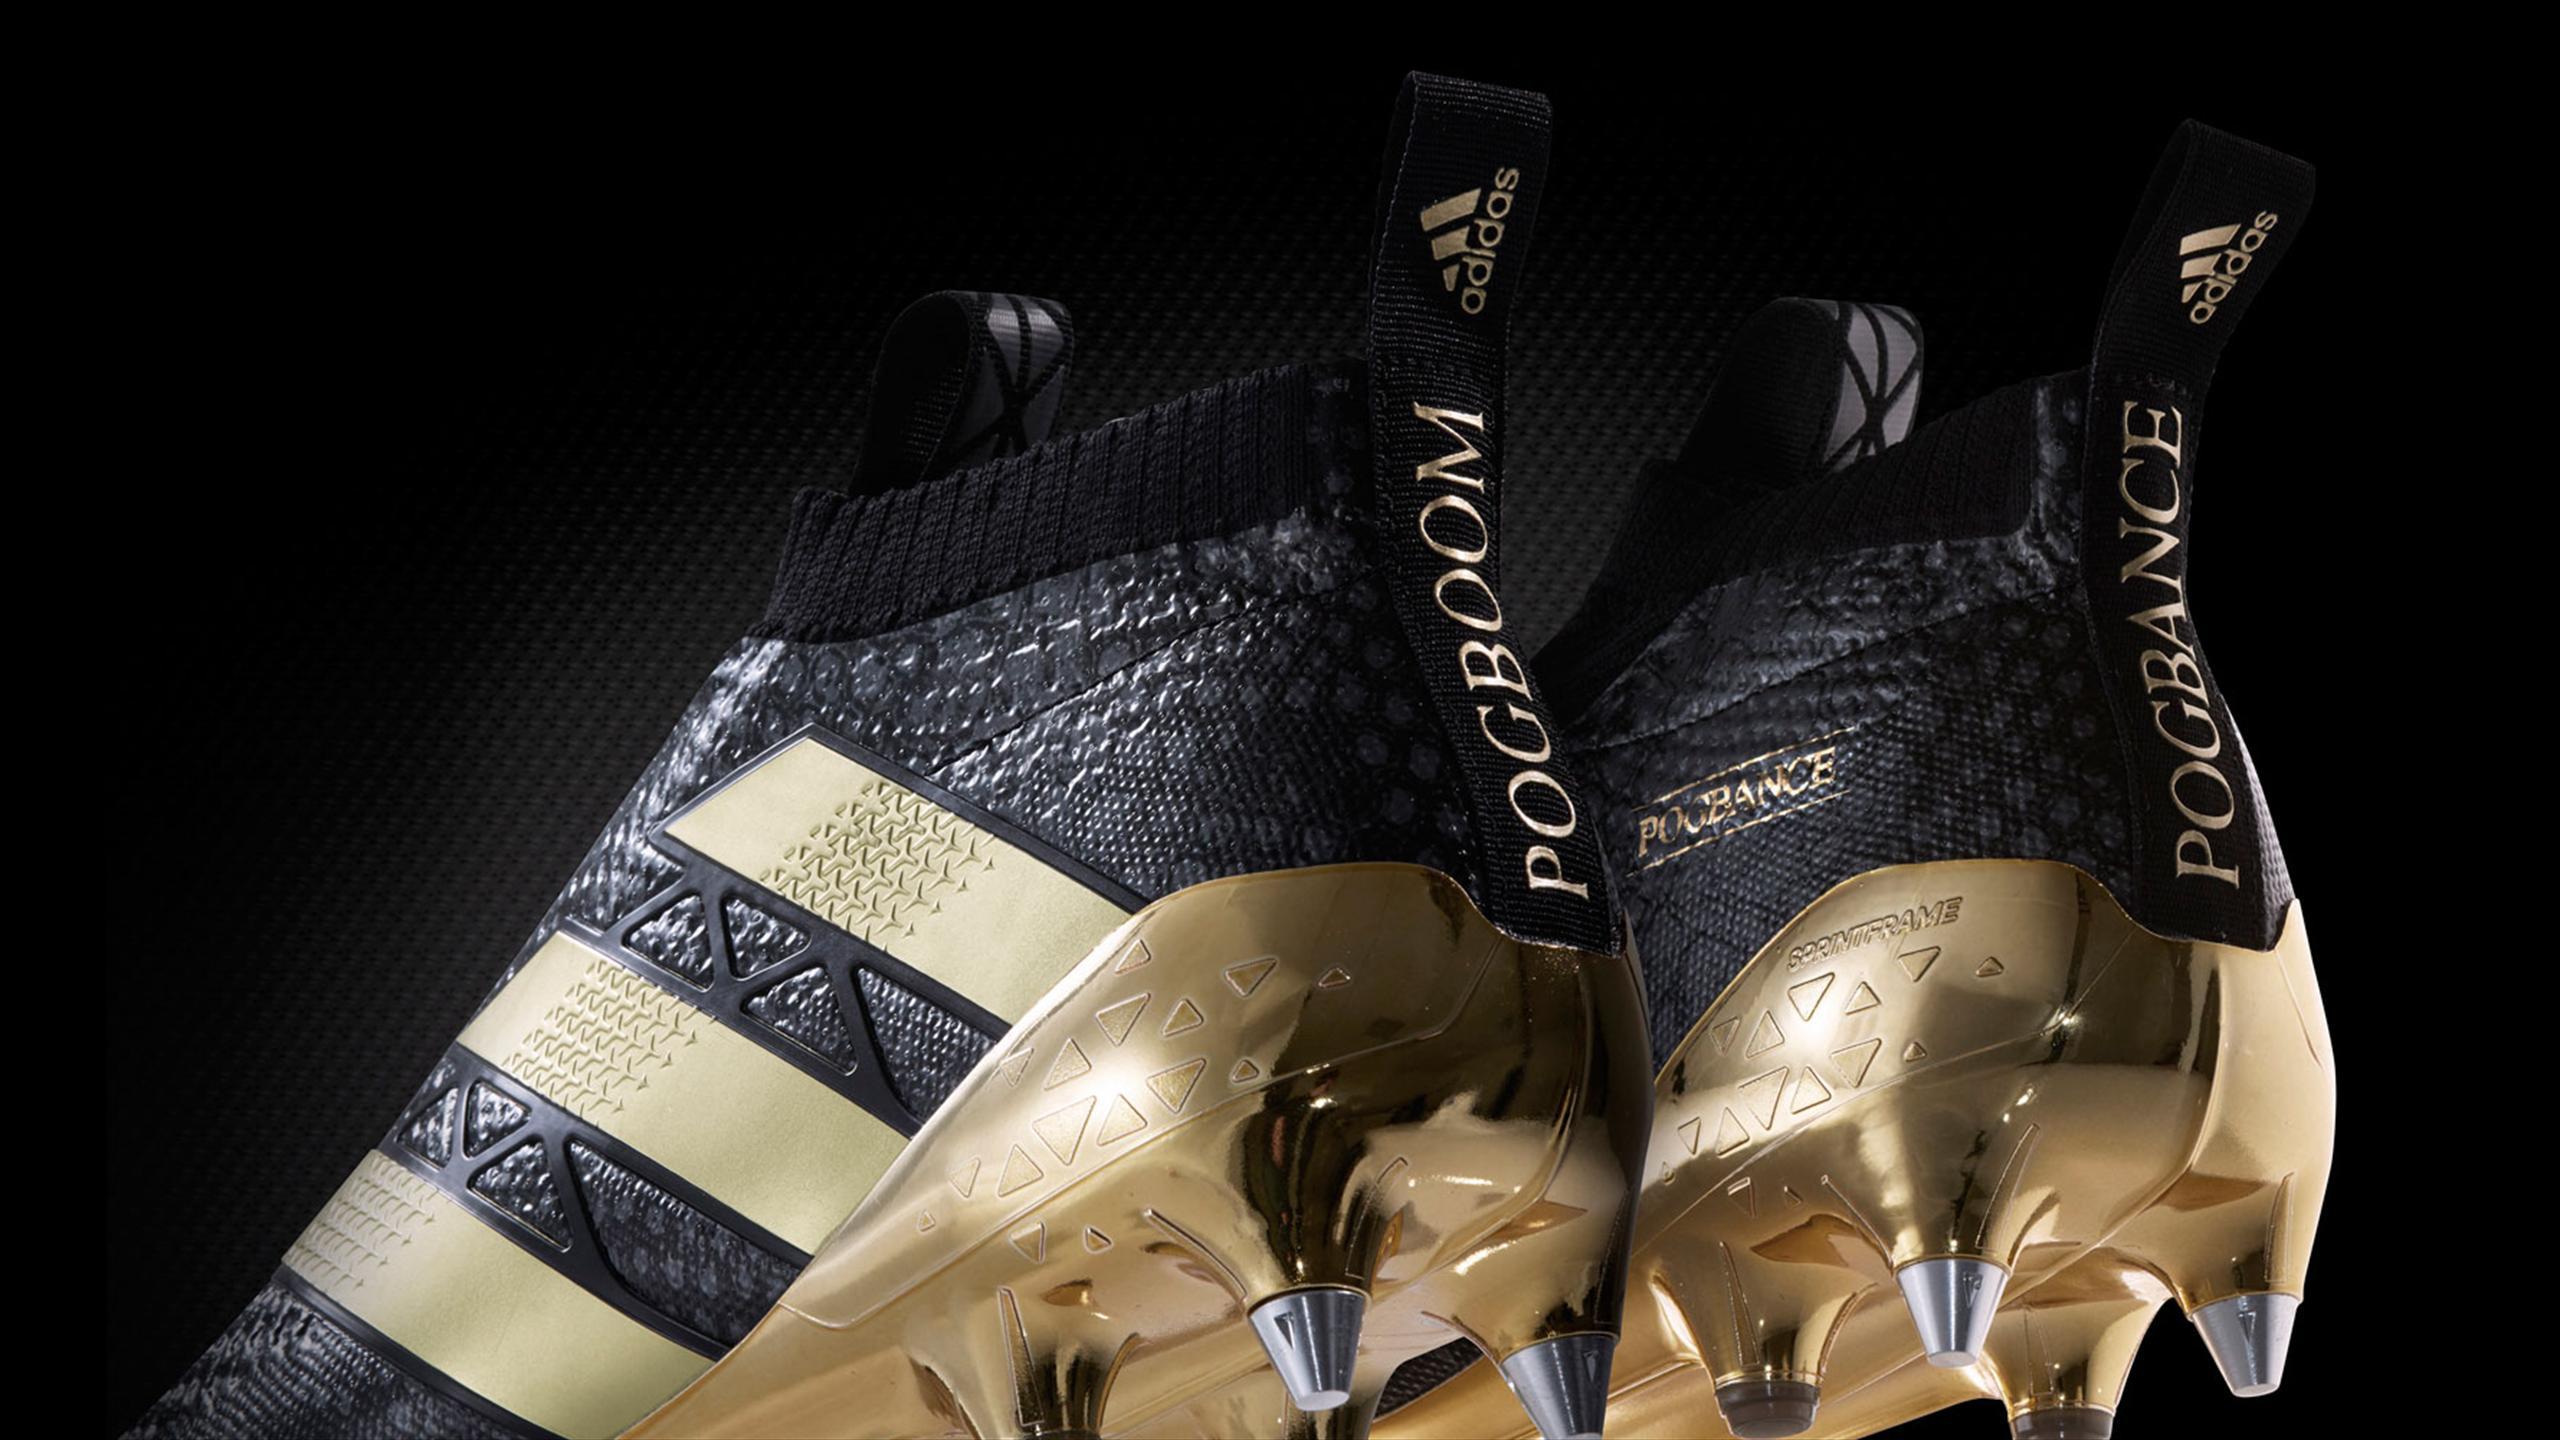 Adidas officialise la signature de Paul Pogba Economie